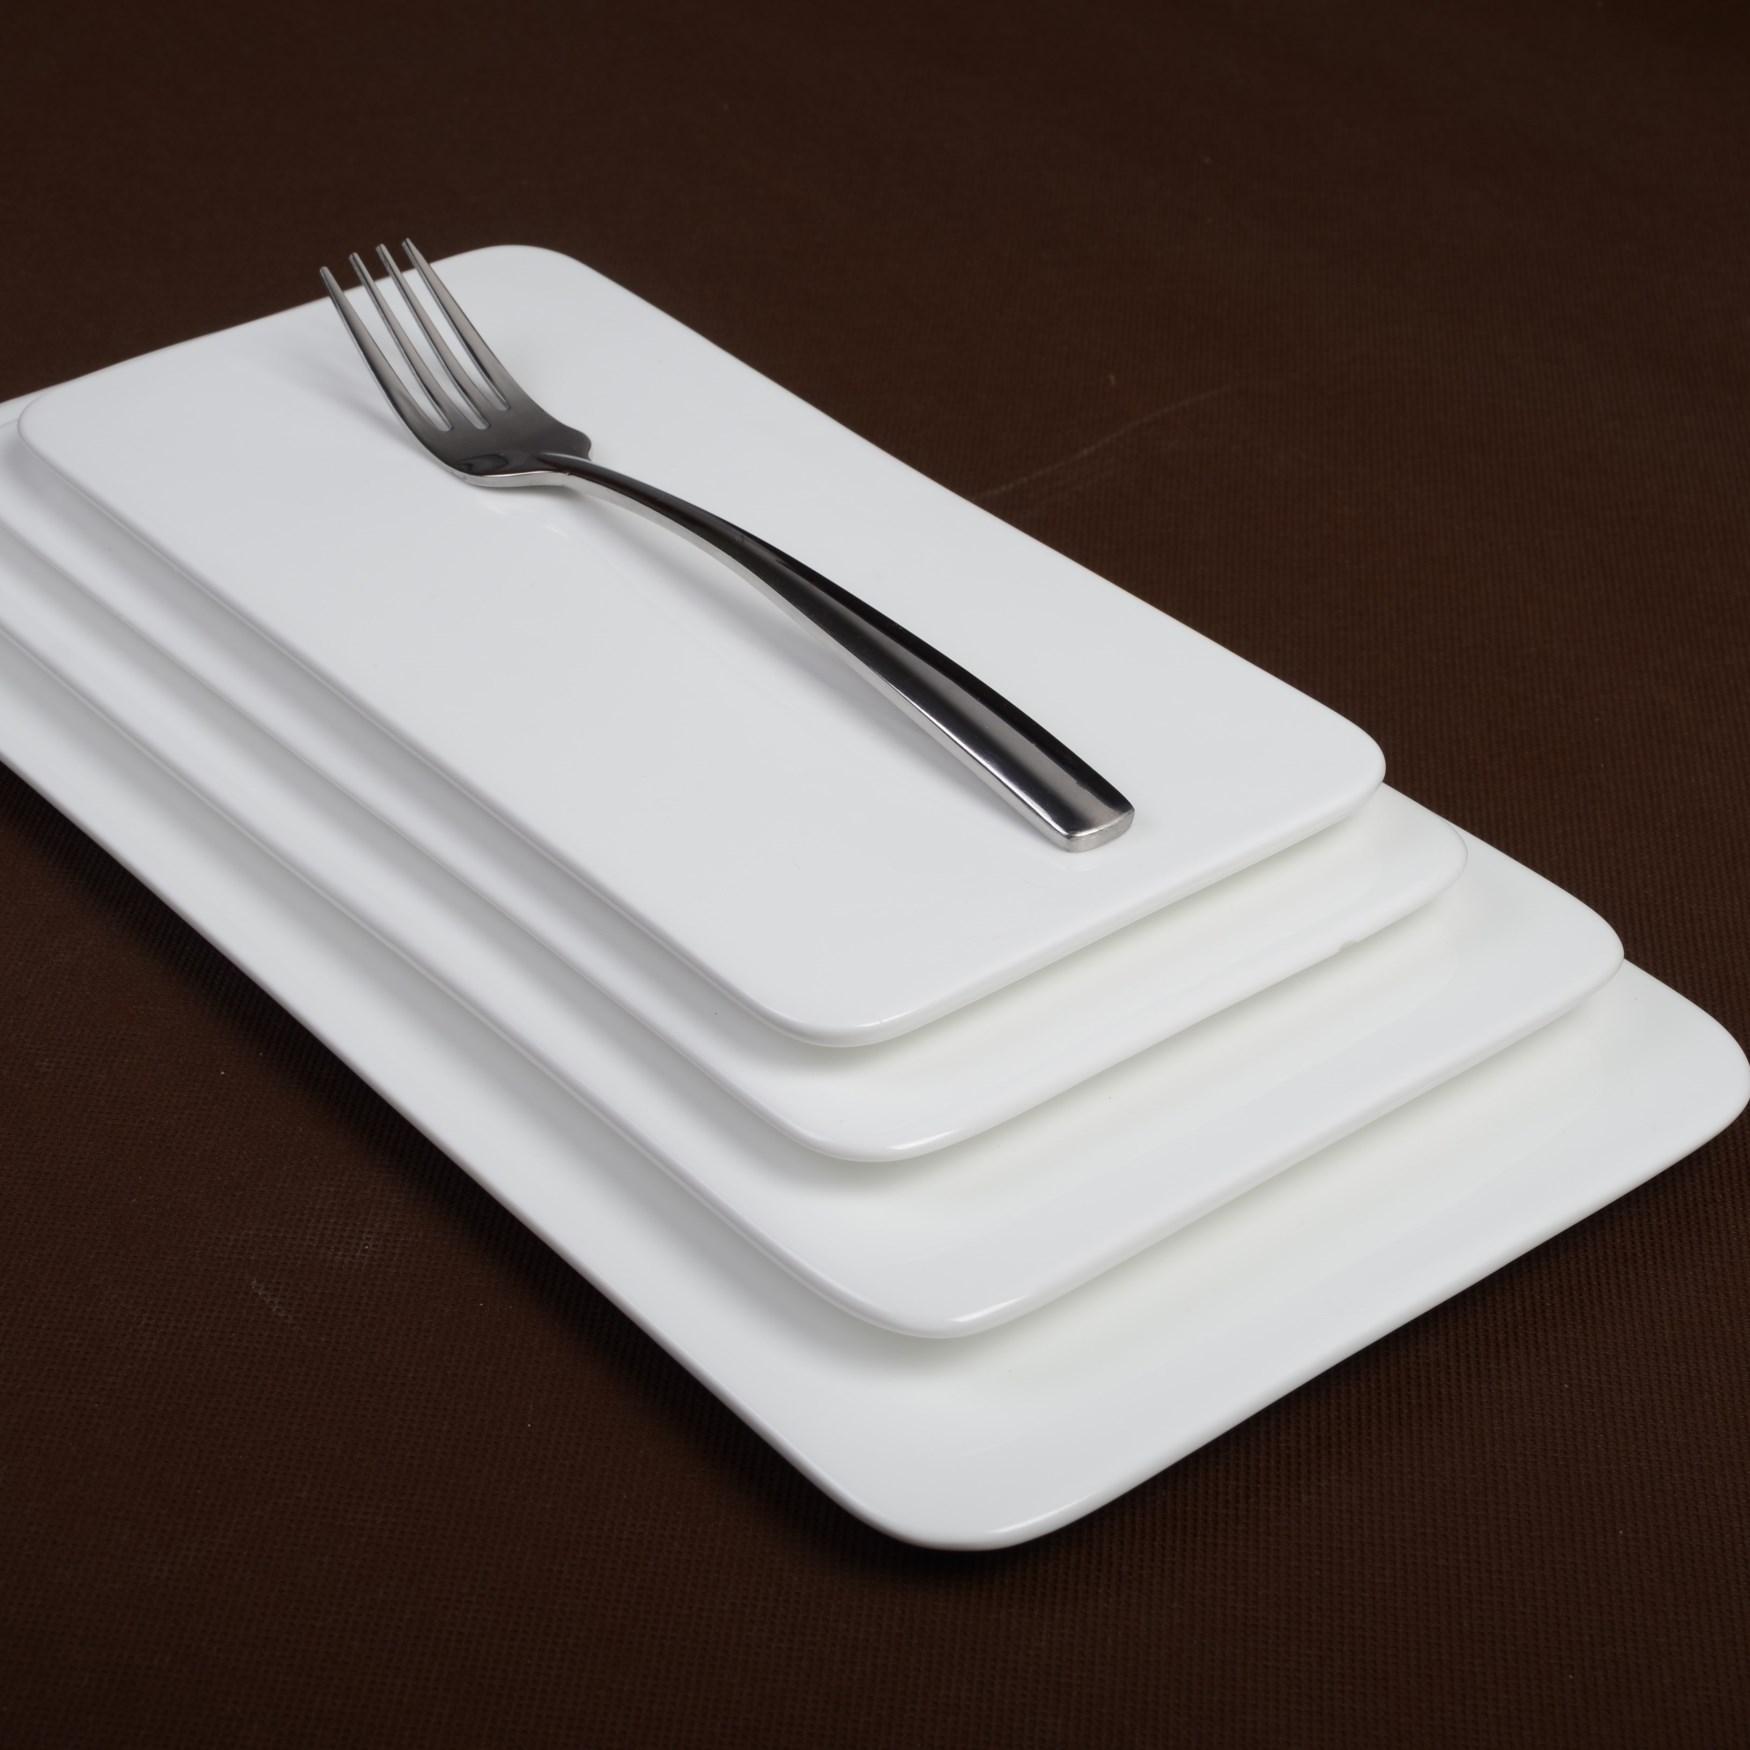 12u0027u0027 14u0027u0027 16 Inch Ceramic Porcelain White Rectangular Flat Steak Plate Dinner Pan Western Style Fruit Sushi Plates Serving Dish-in Porcelain Plates from ... & 12u0027u0027 14u0027u0027 16 Inch Ceramic Porcelain White Rectangular Flat Steak ...